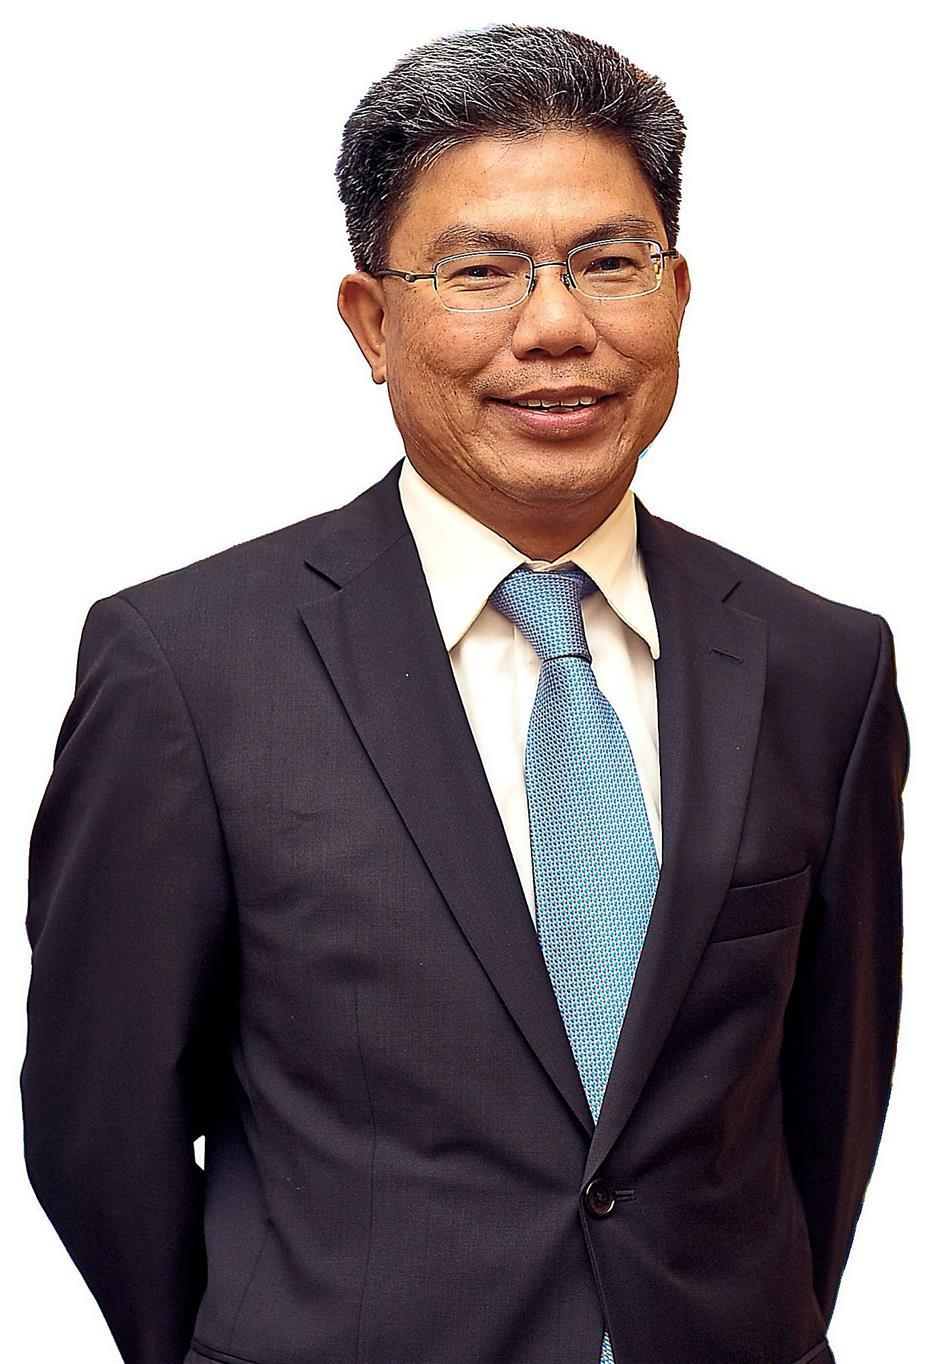 Datuk Khairussaleh RamliGroup Managing Director for RHB Banking Group